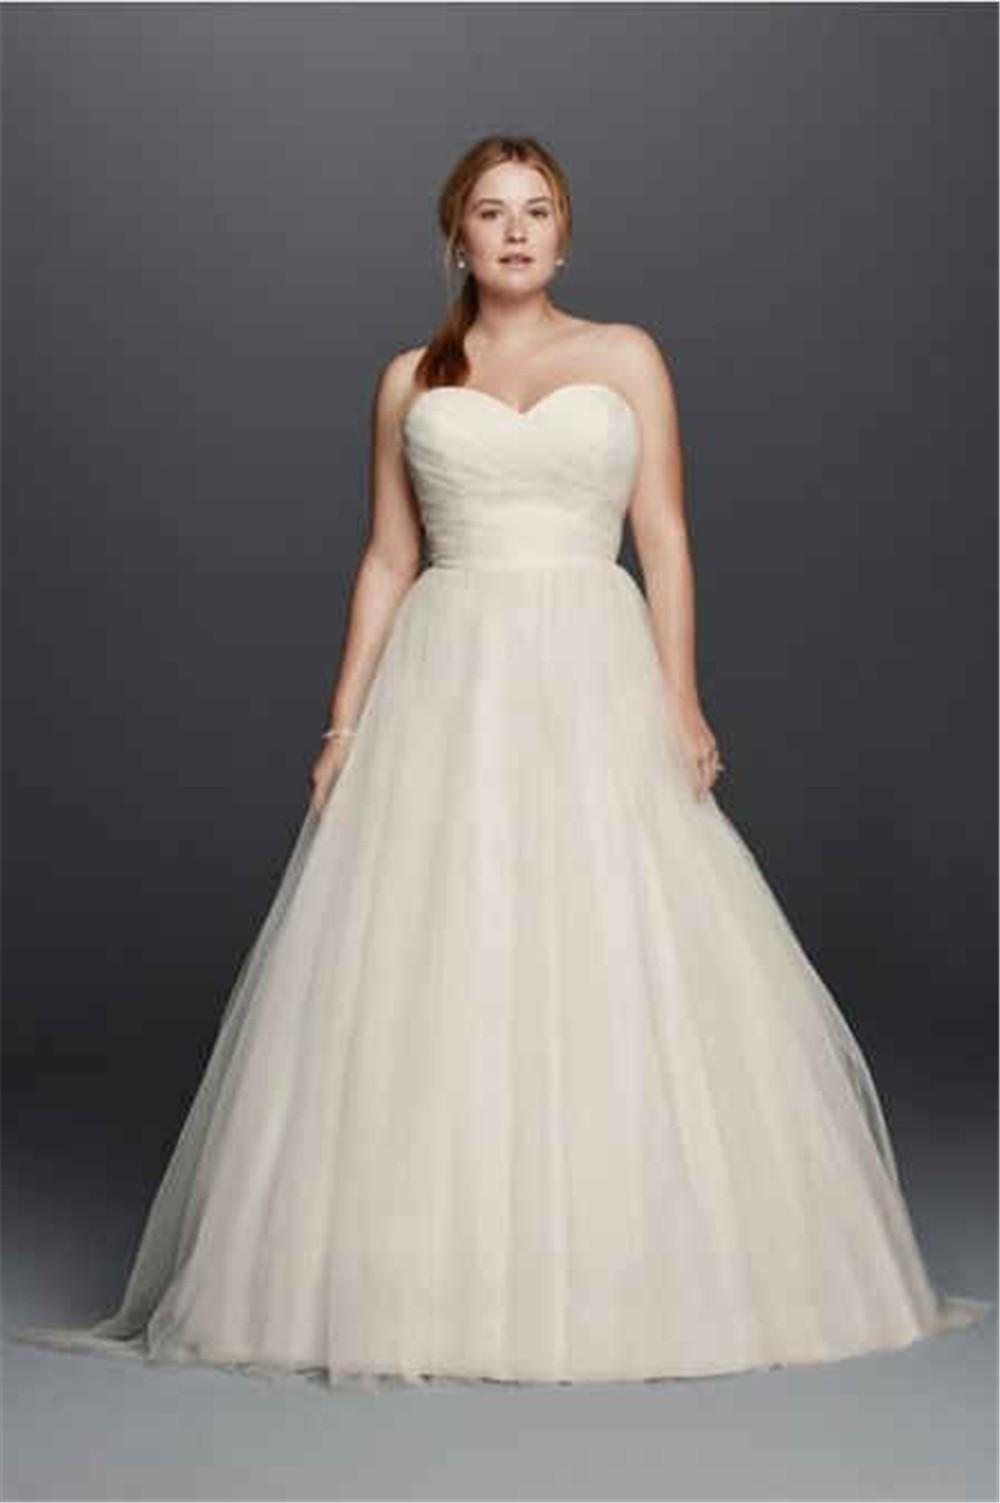 Plus size strapless sweetheart tulle wedding dress 9wg3802 for Expensive plus size wedding dresses